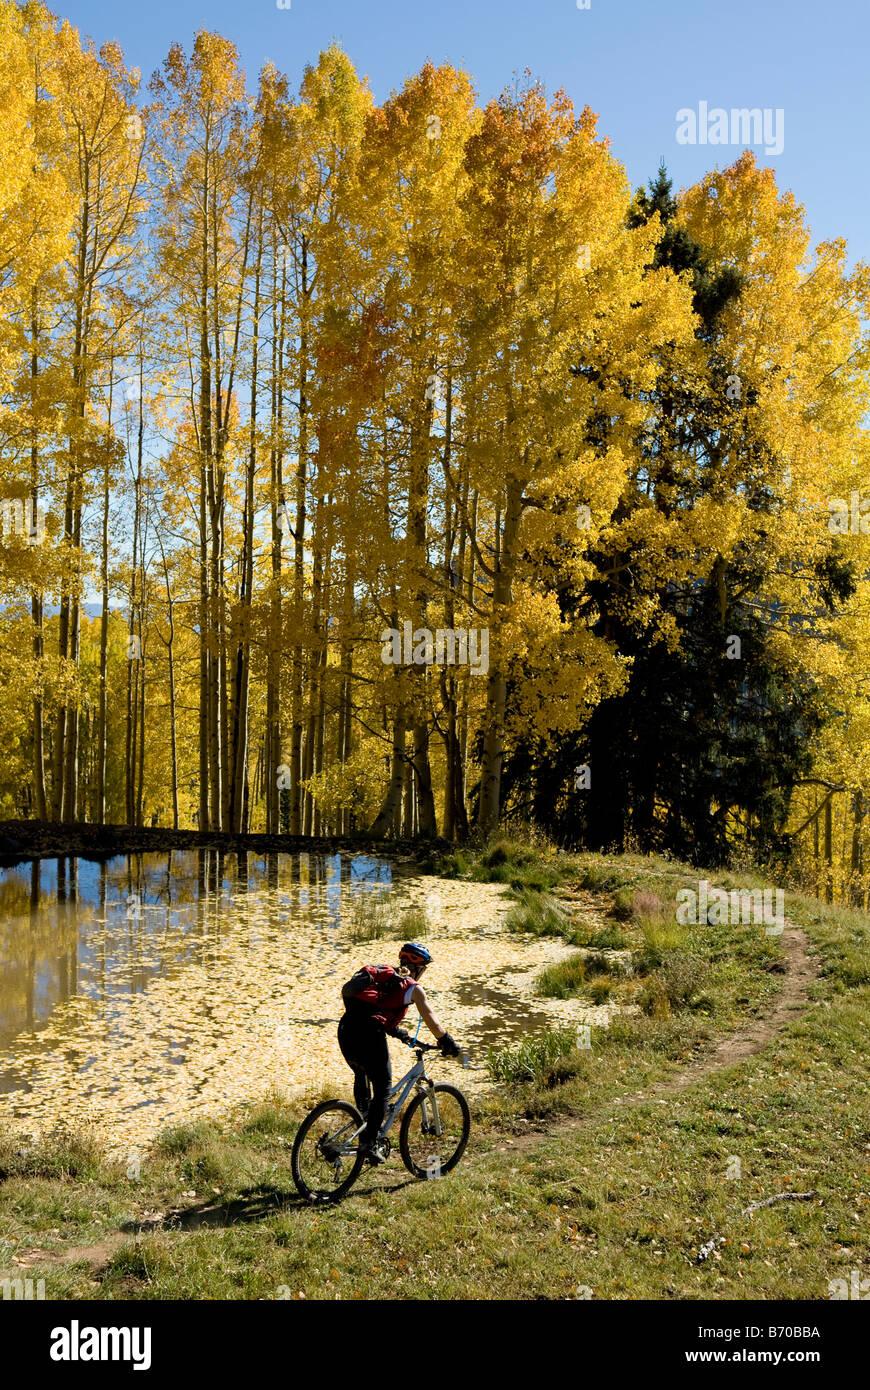 Woman mountain biking past lake with yellow aspen leaves, San Juan National Forest, Colorado. - Stock Image